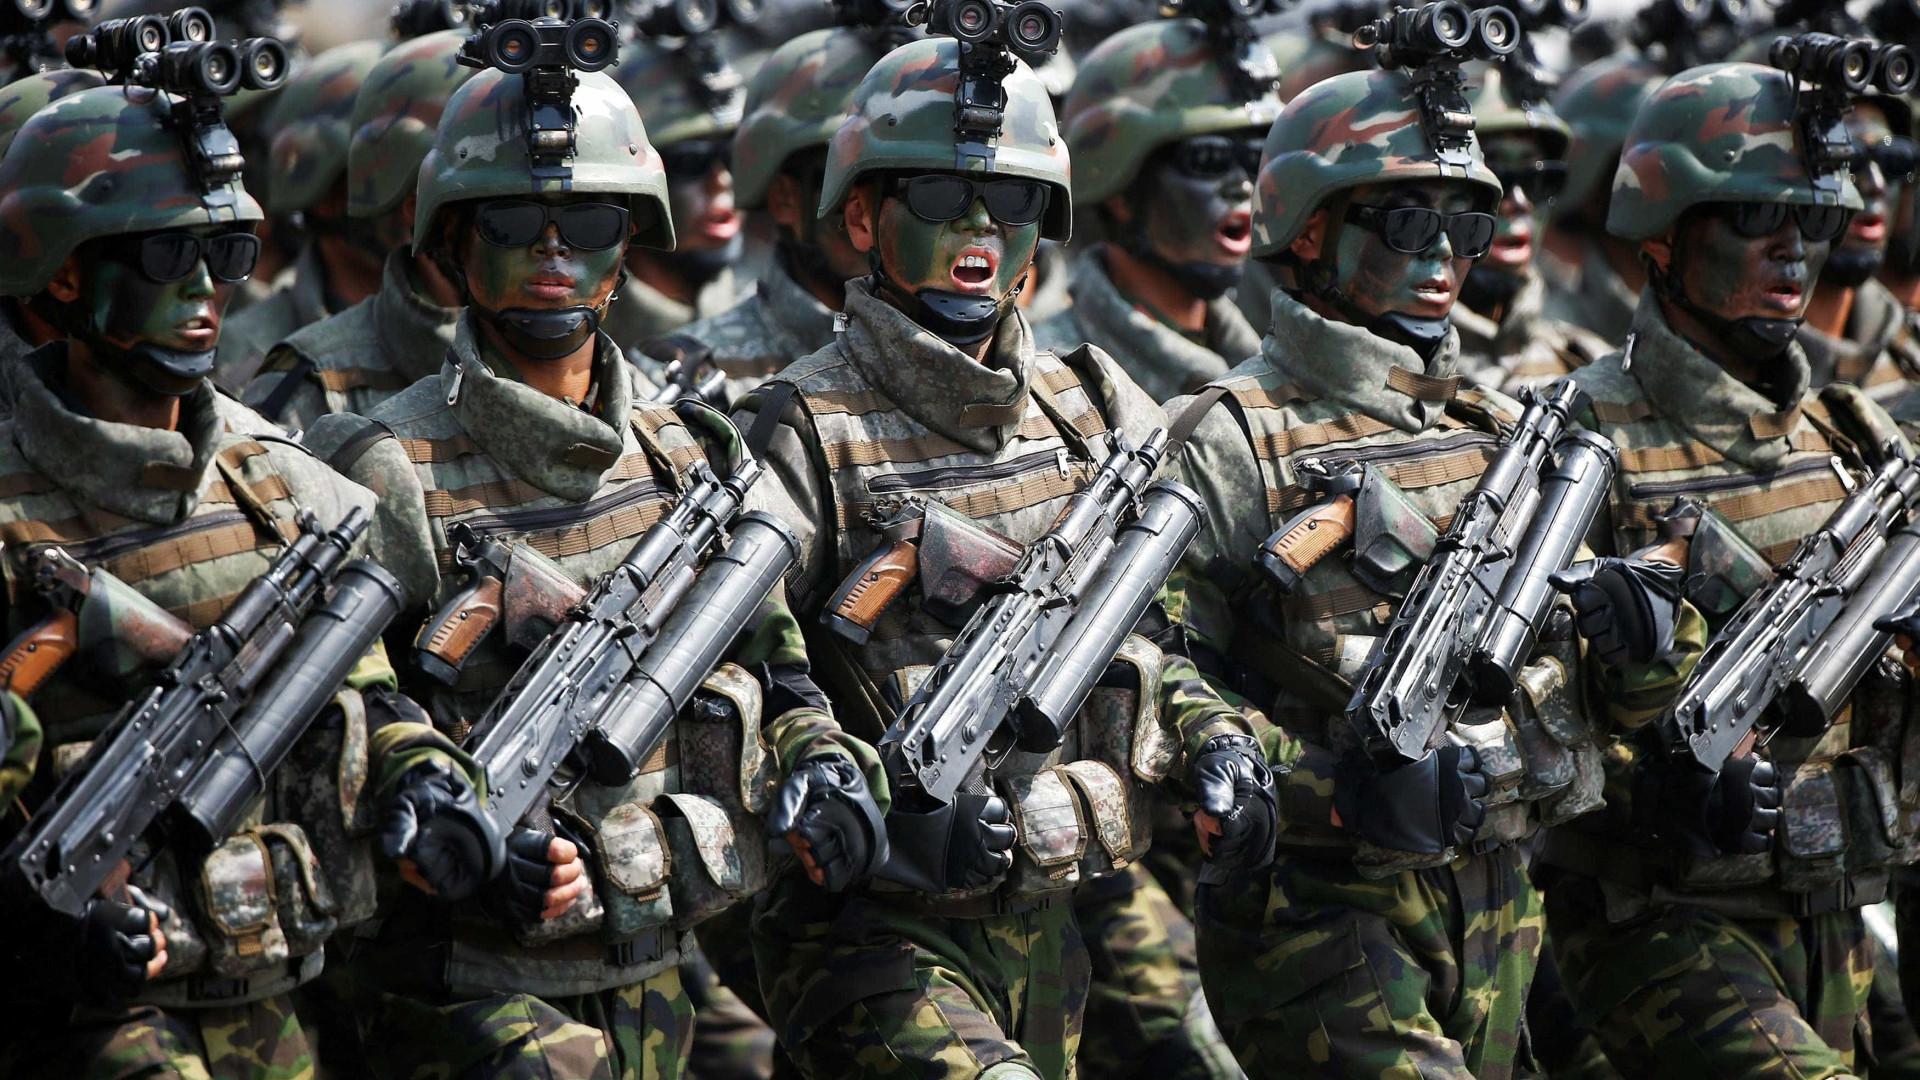 Soldados norte-coreanos a jogar voleibol numa base nuclear?